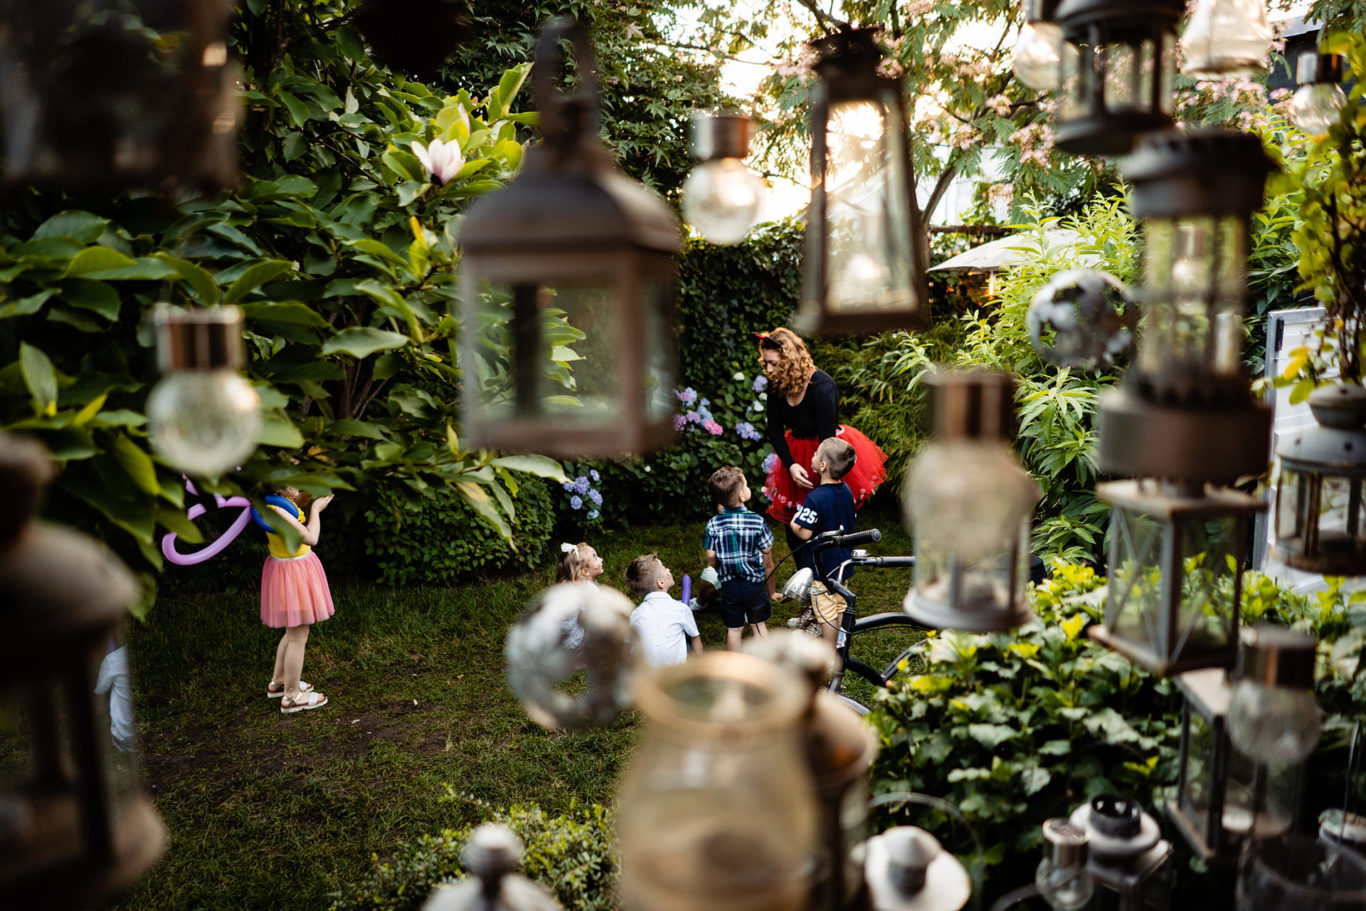 Garden fun - foto Ciprian Dumitrescu